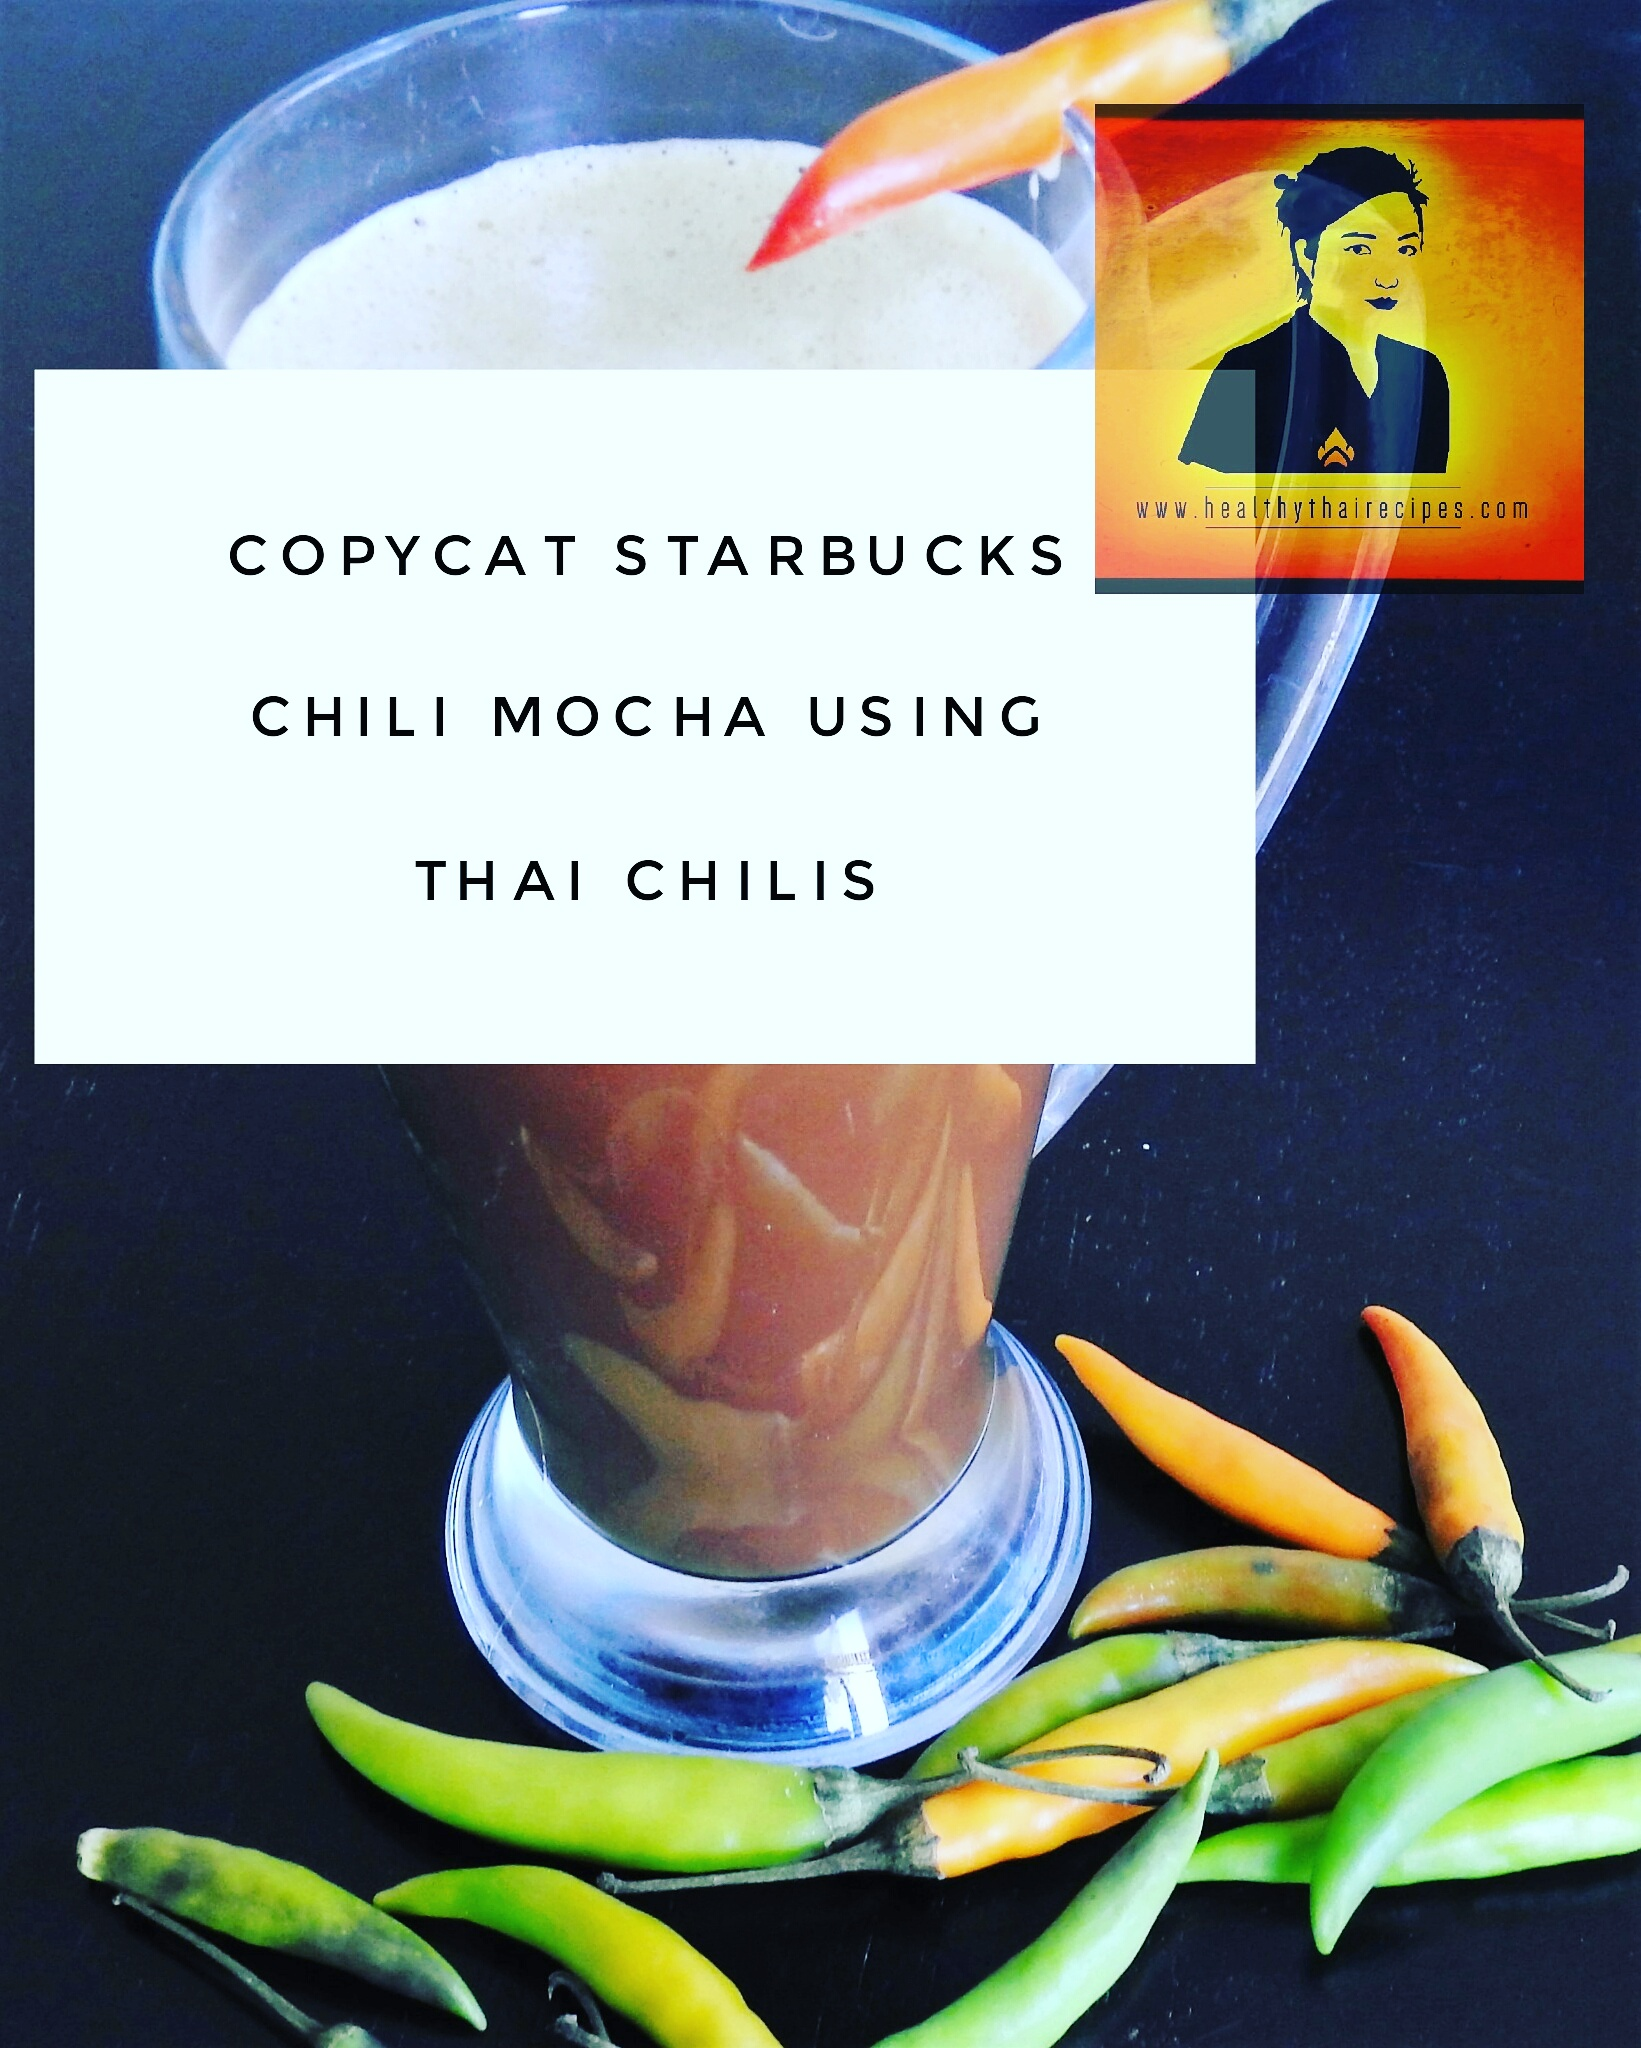 Copycat Starbucks Chili Mocha Thai Style